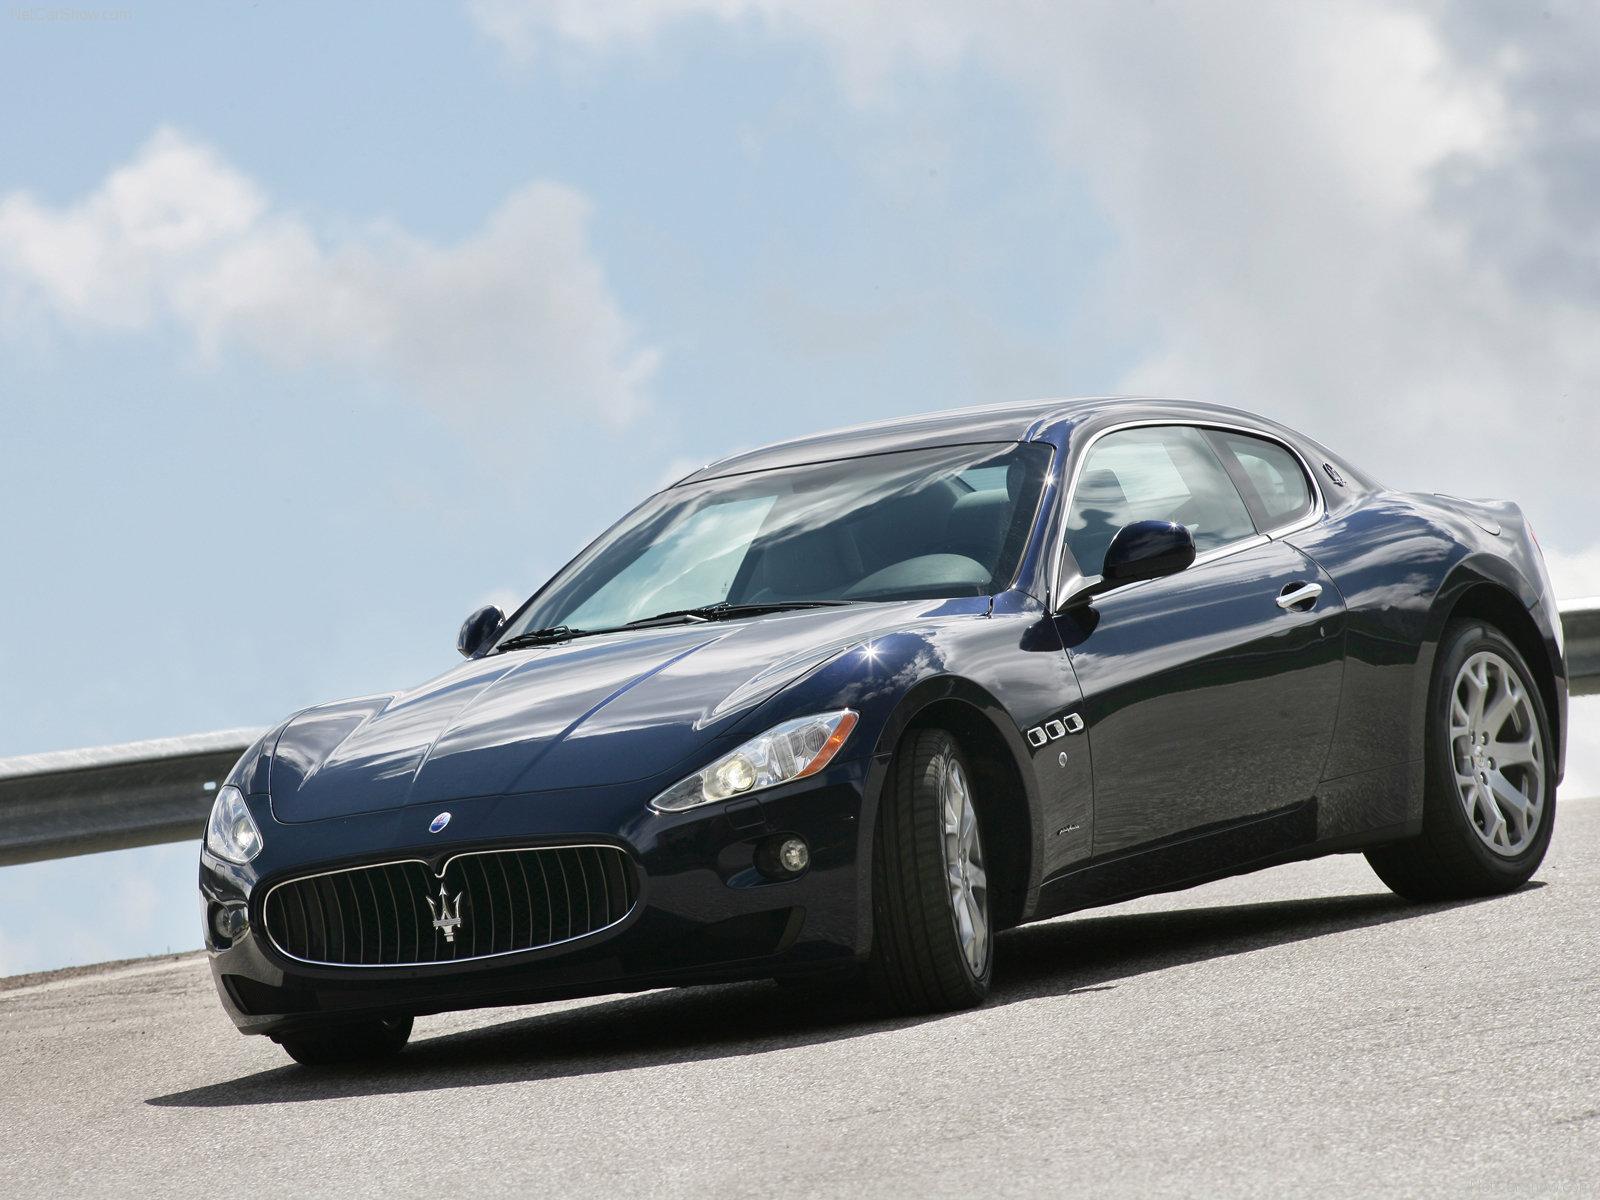 Hình ảnh siêu xe Maserati GranTurismo 2008 & nội ngoại thất